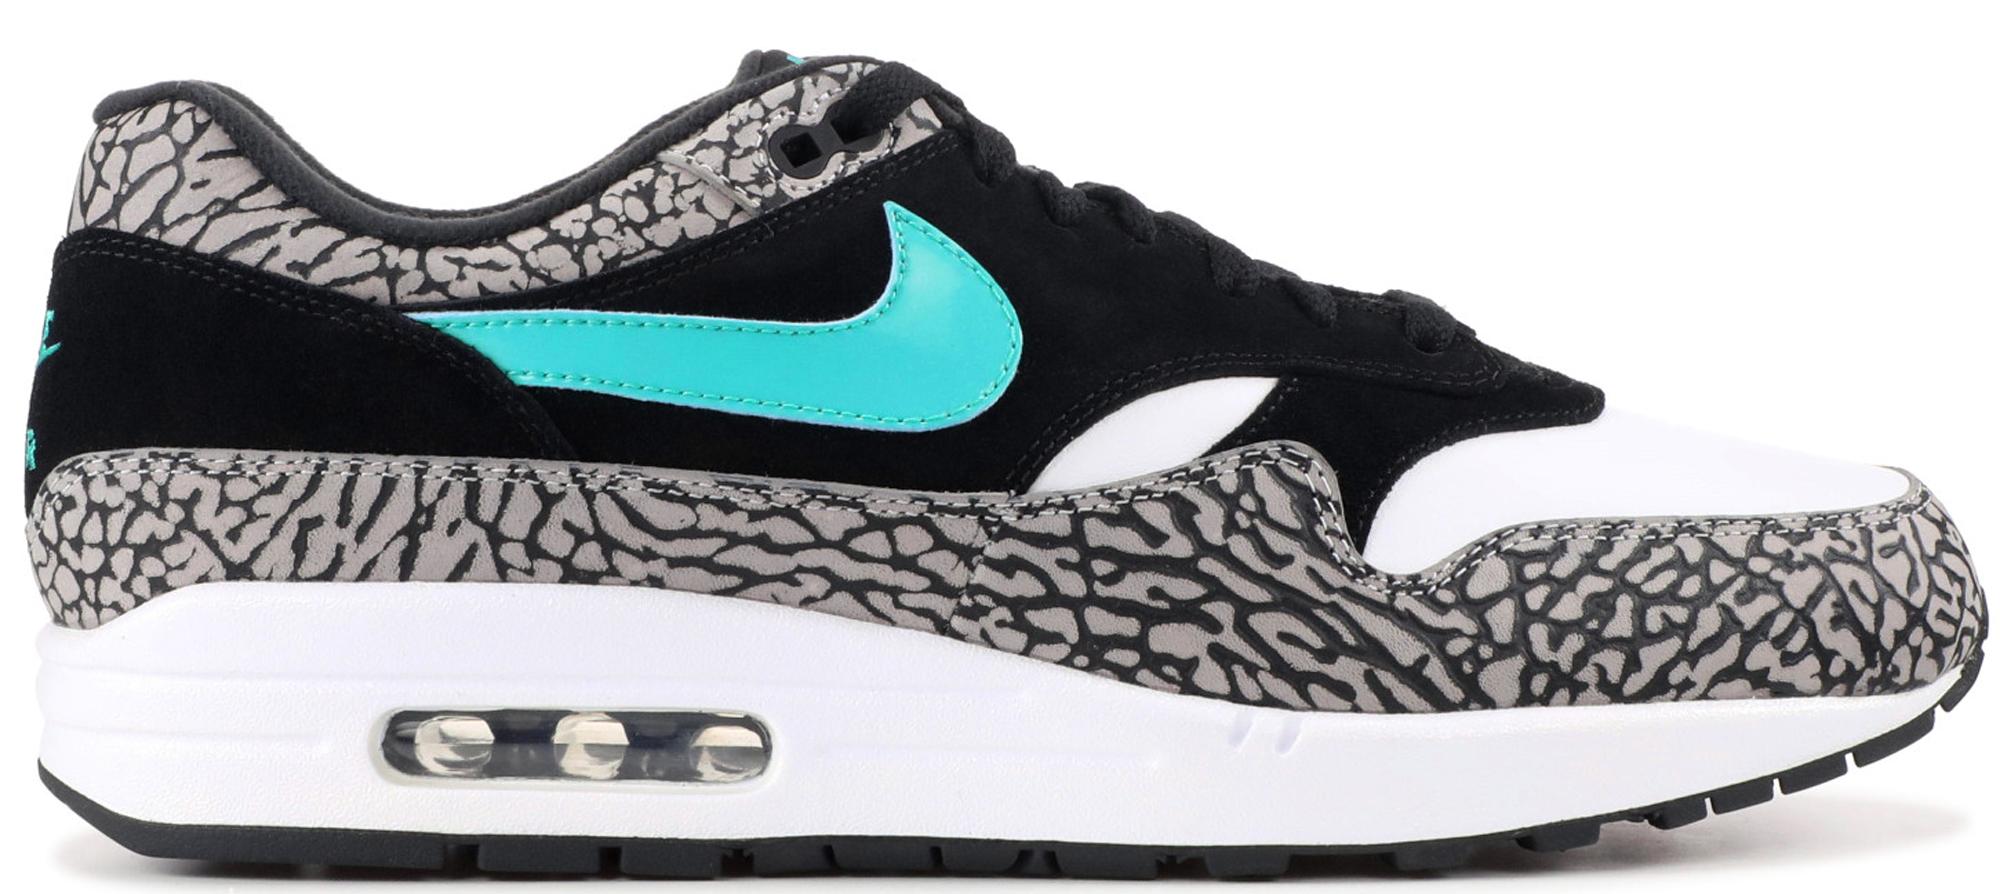 Nike Air Max 1 Atmos x Jordan - 923093-001